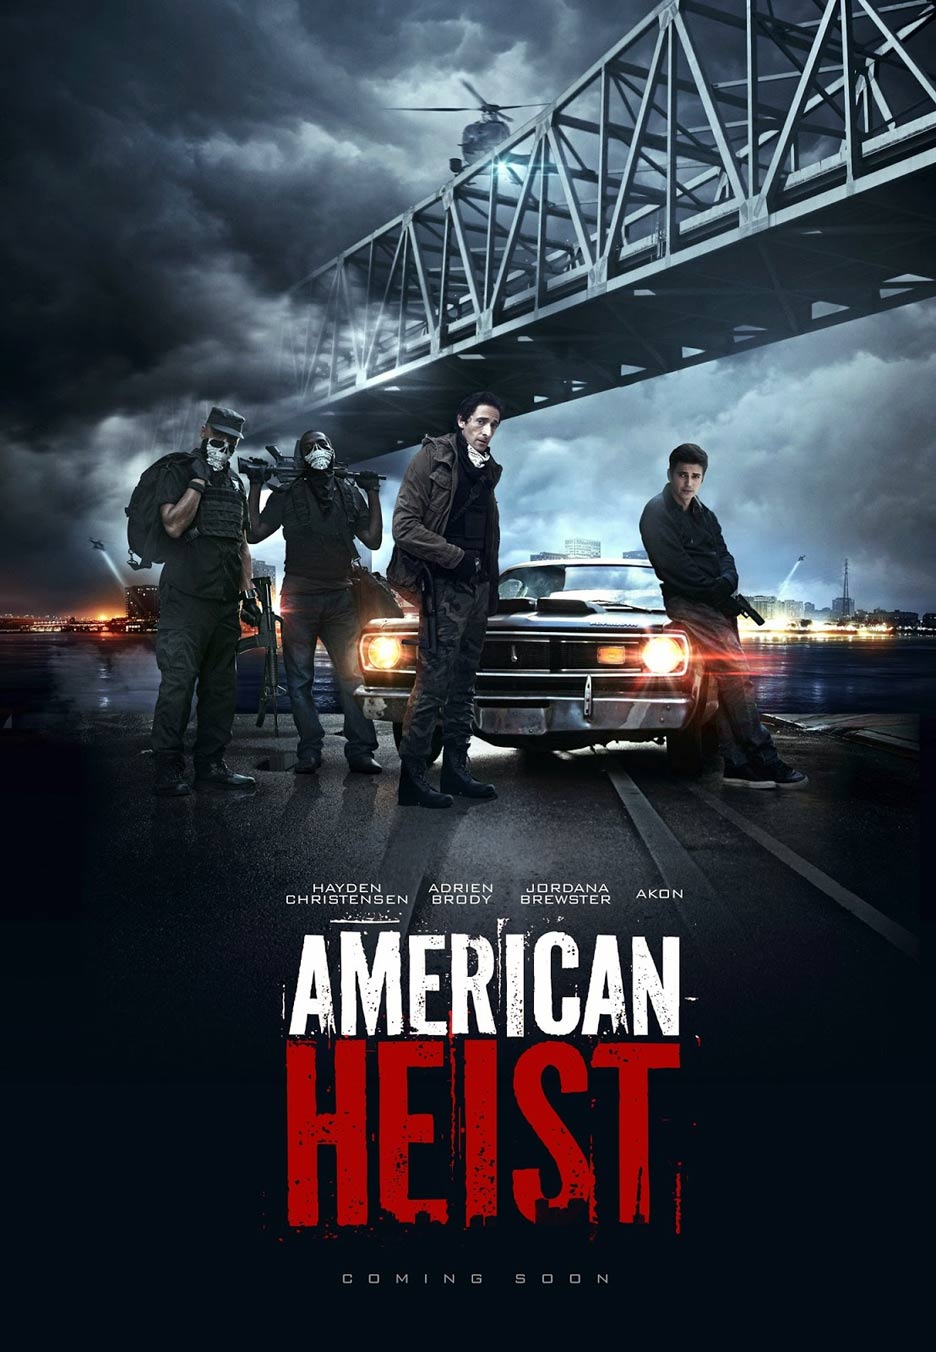 American Heist Poster #1